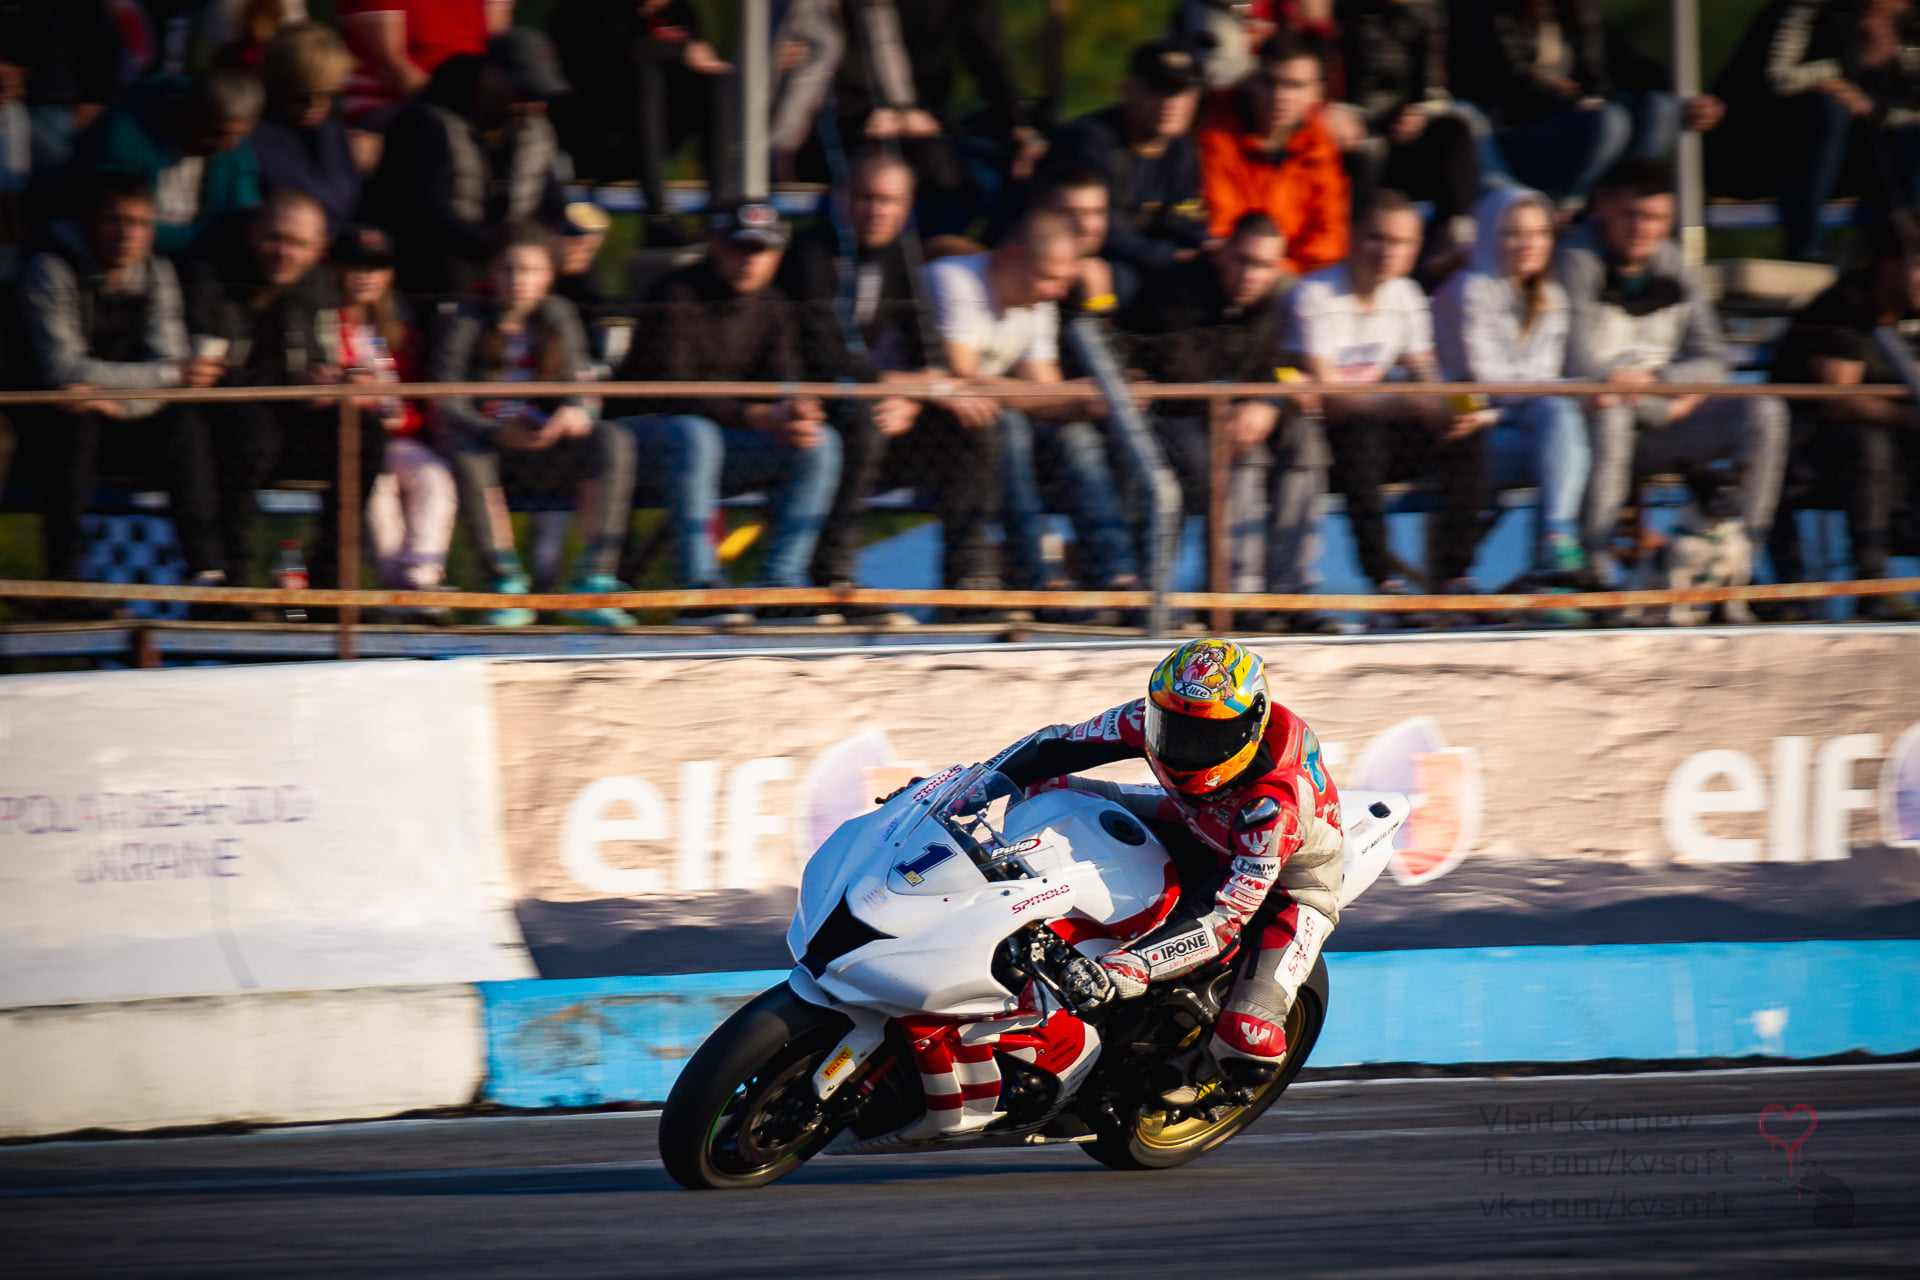 5-6_etap_MotoGPUkraine_030